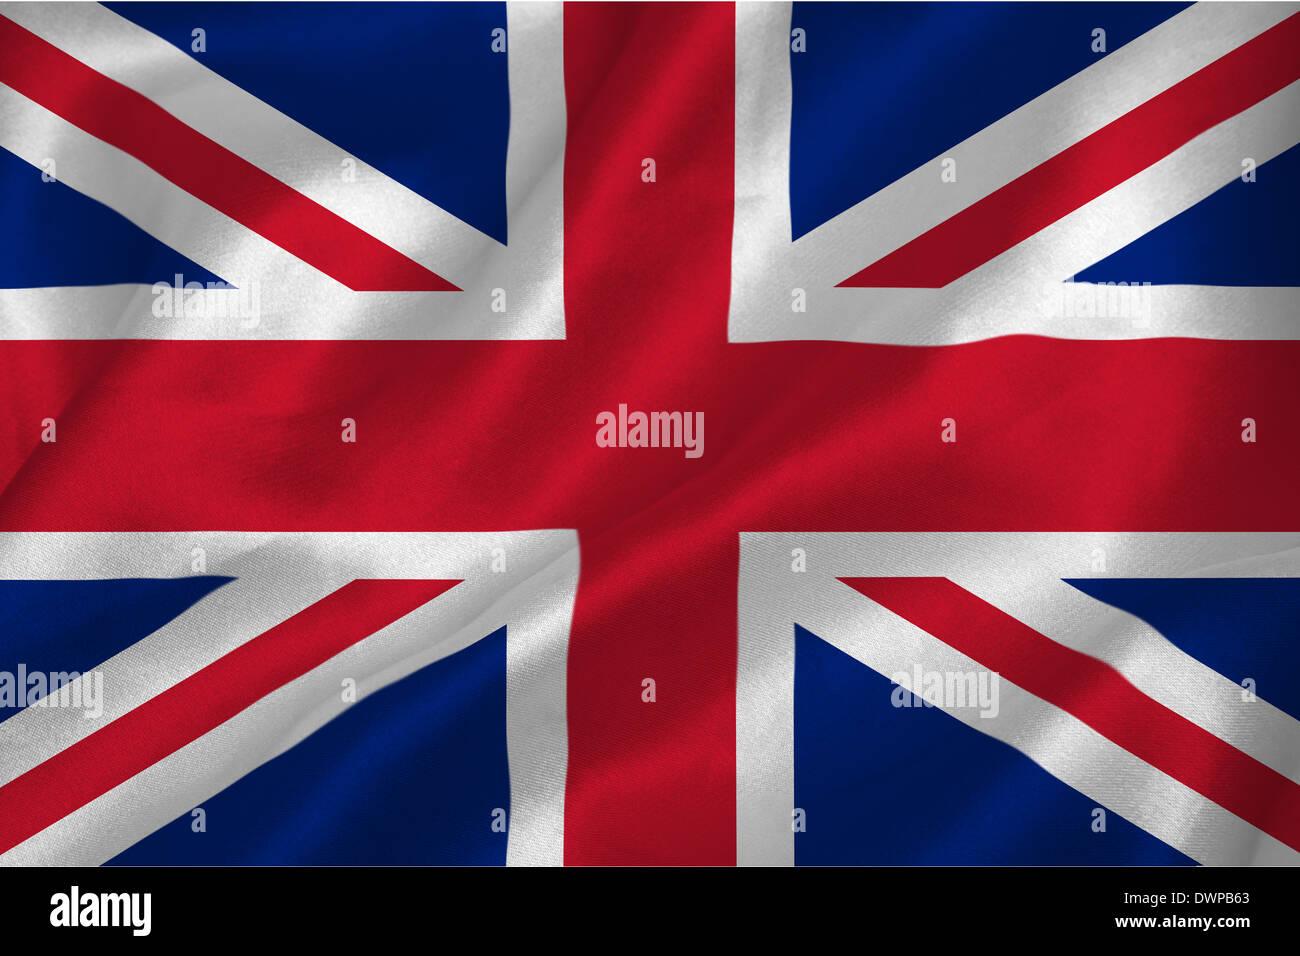 Great britian flag - Stock Image